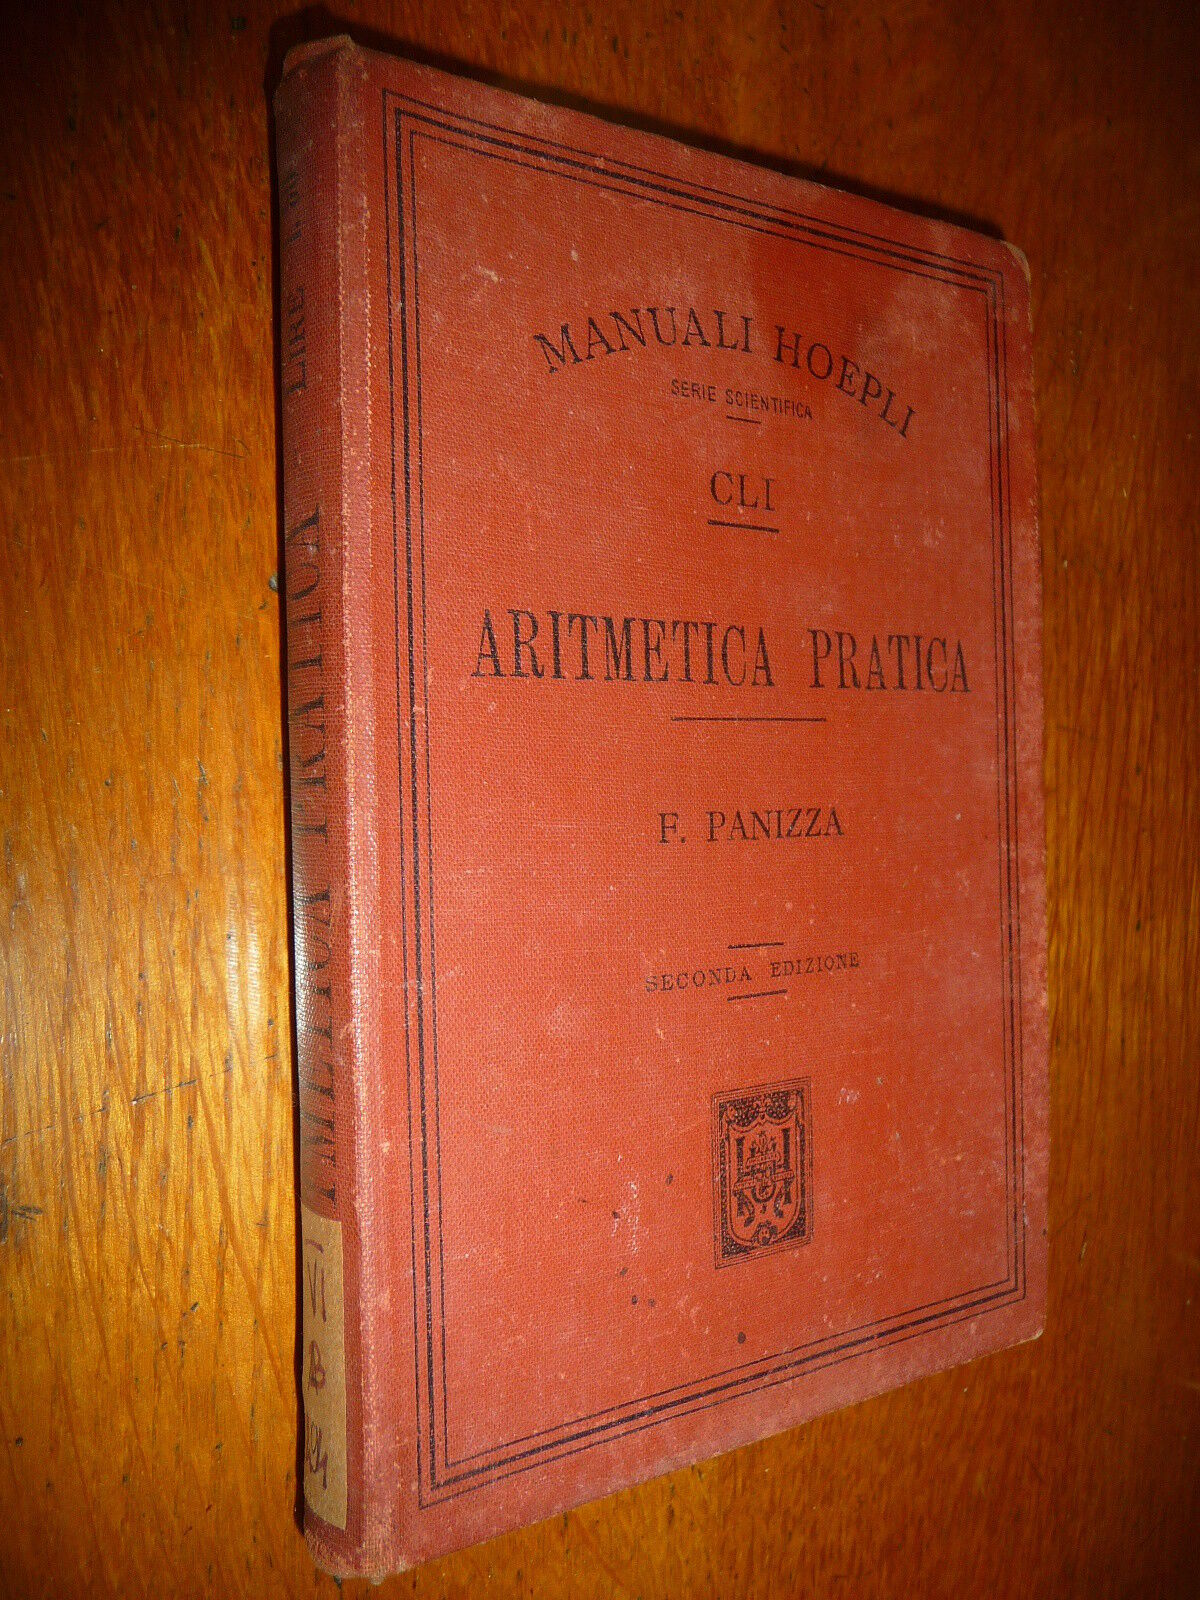 ARITMETICA PRATICA F. PANIZZA HOEPLI 1899 II^ Ed.